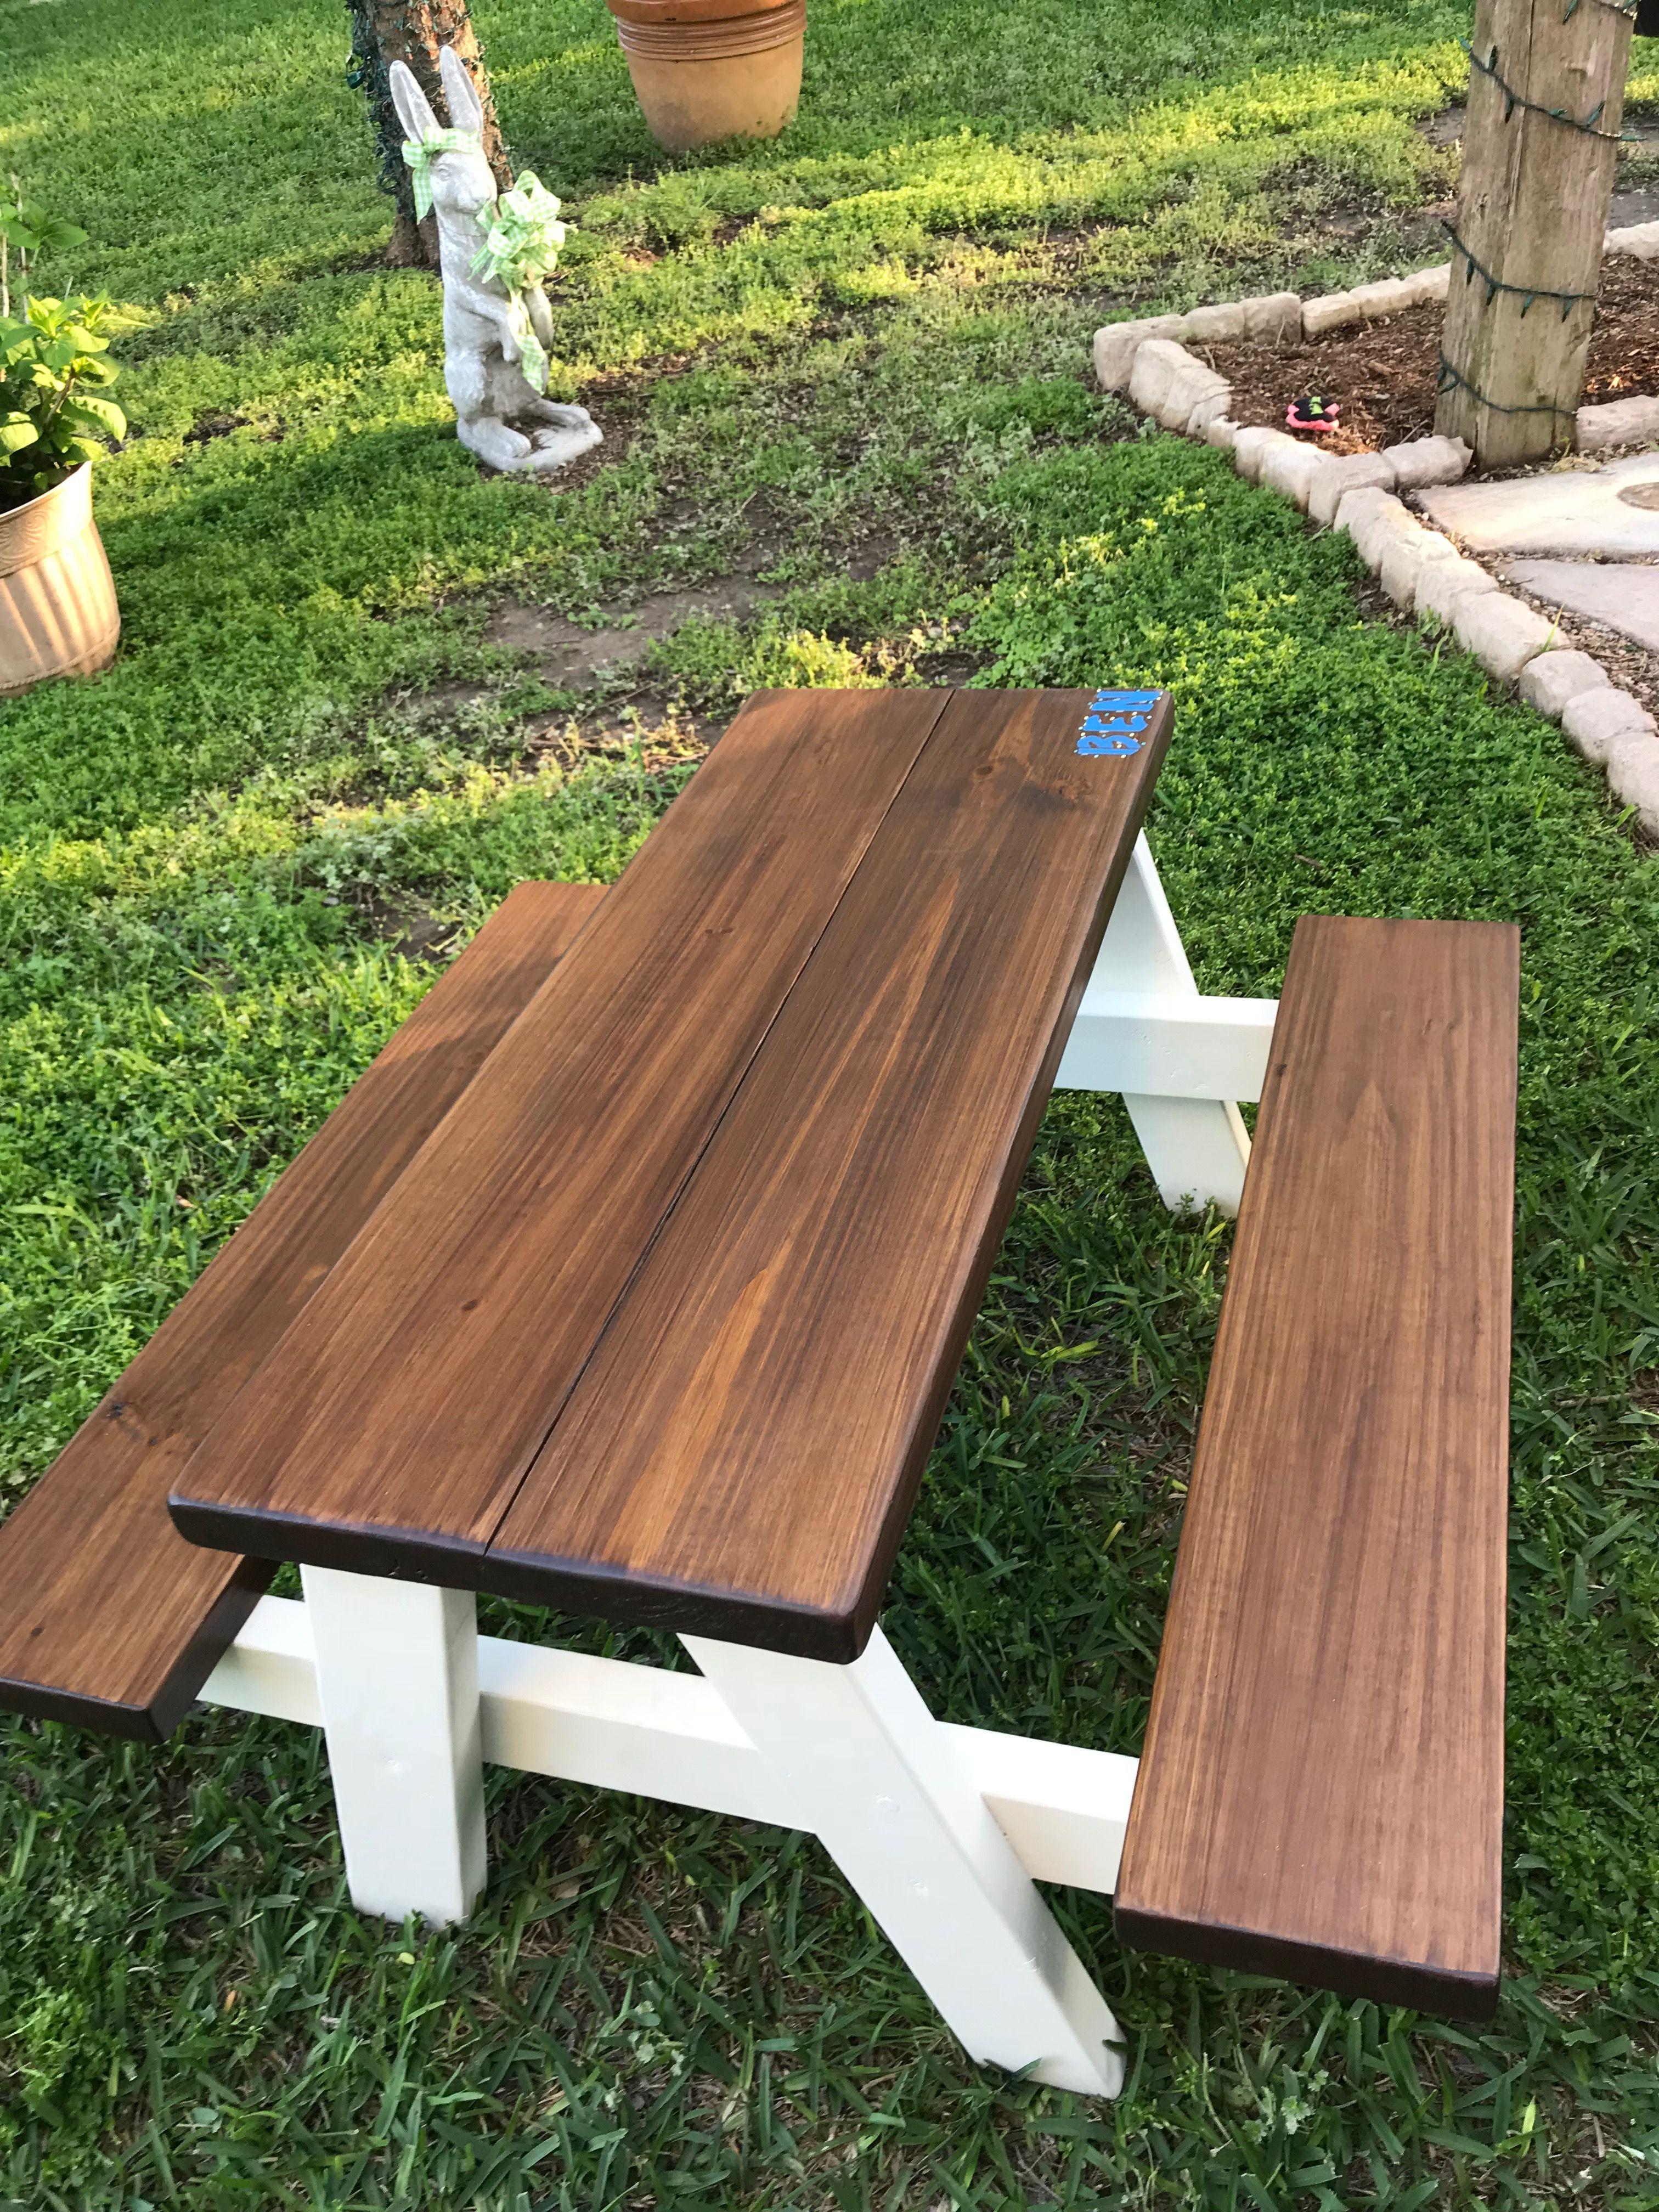 Diy farmhouse kids picnic table 2x8s and 2x4s 225